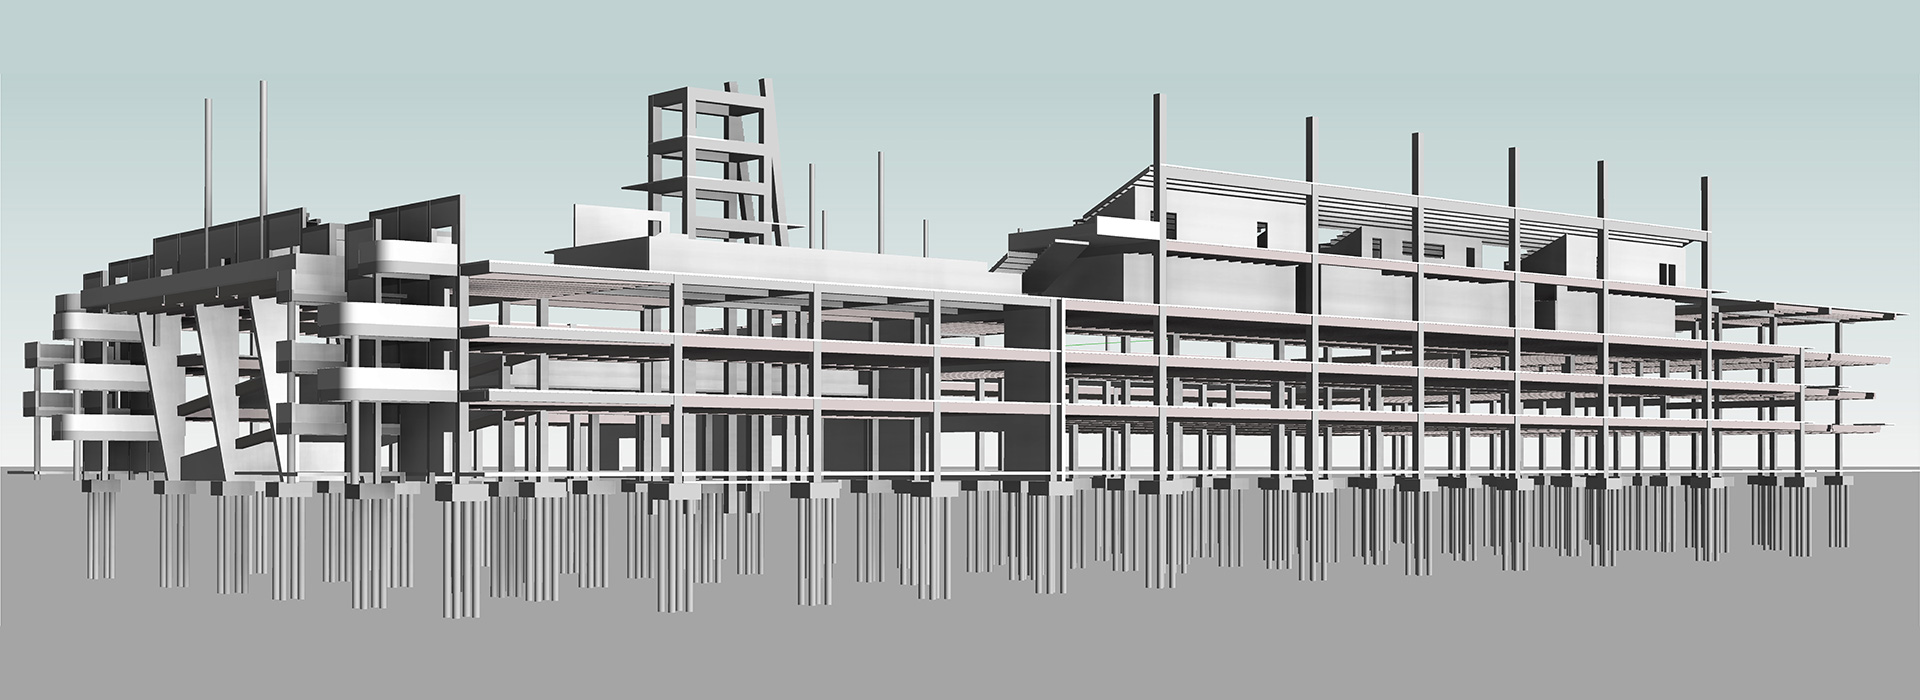 3D-Structural-BIM-Model-Commercial-Revit-Modeling-by-United-BIM